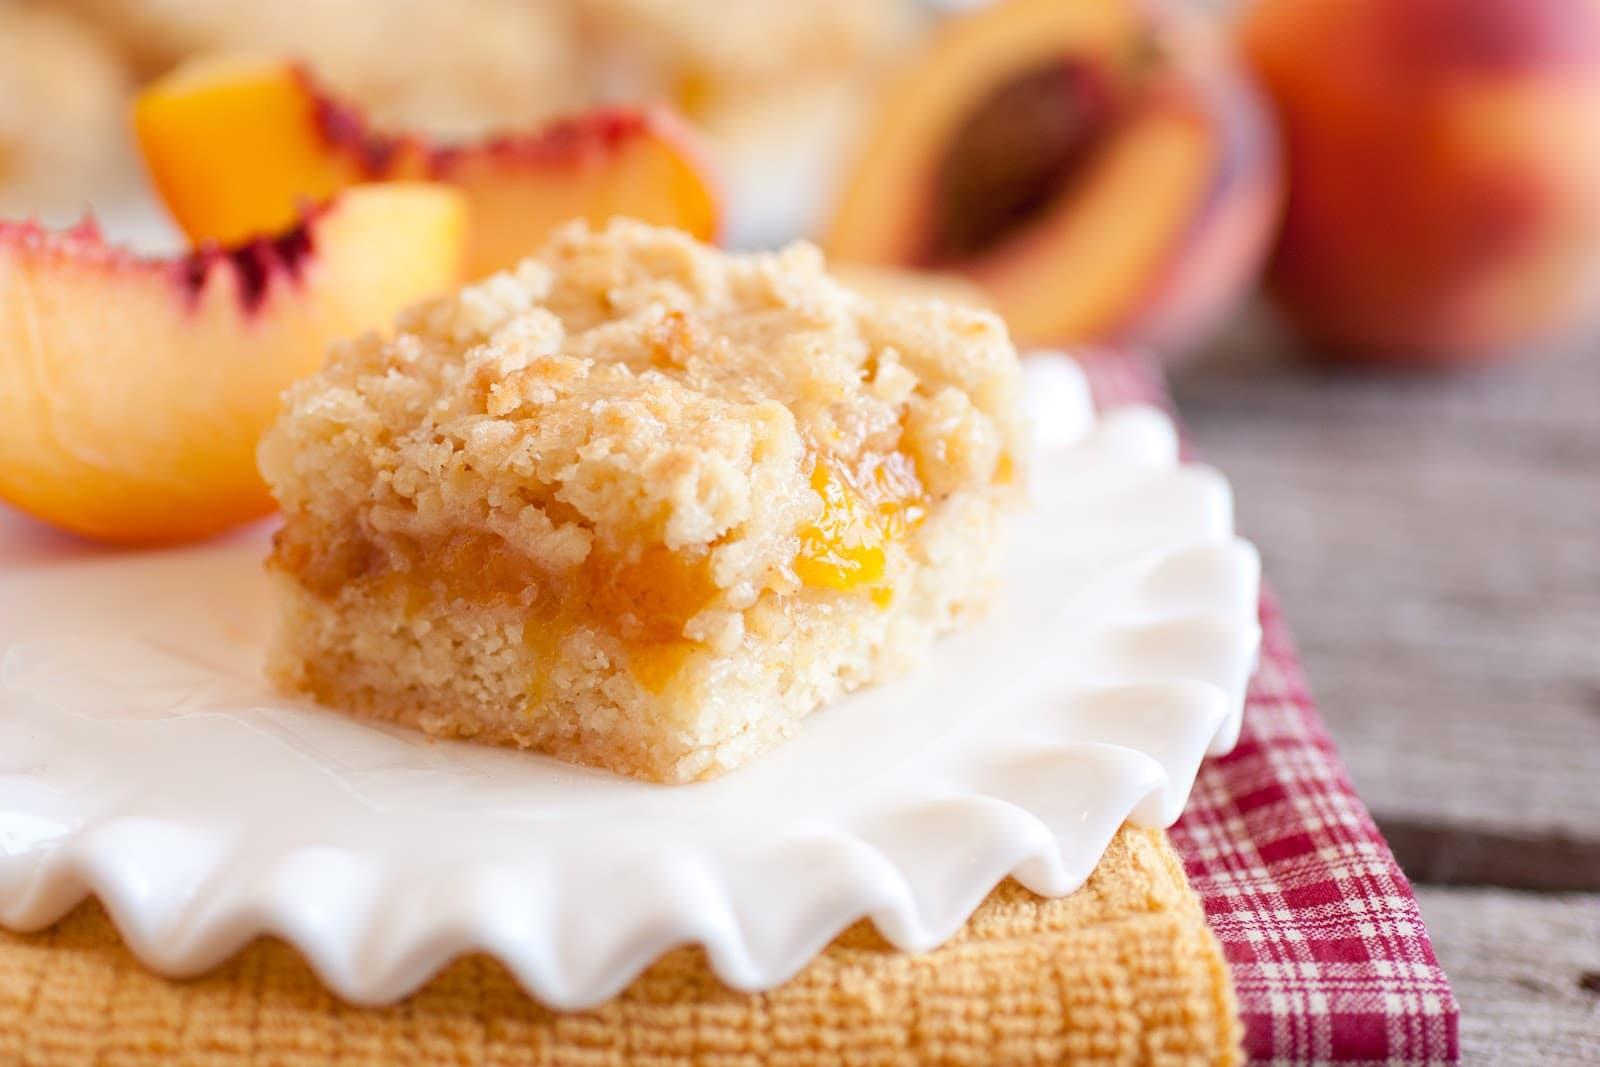 Peach Desserts Recipes  Peach Crumb Bars Cooking Classy